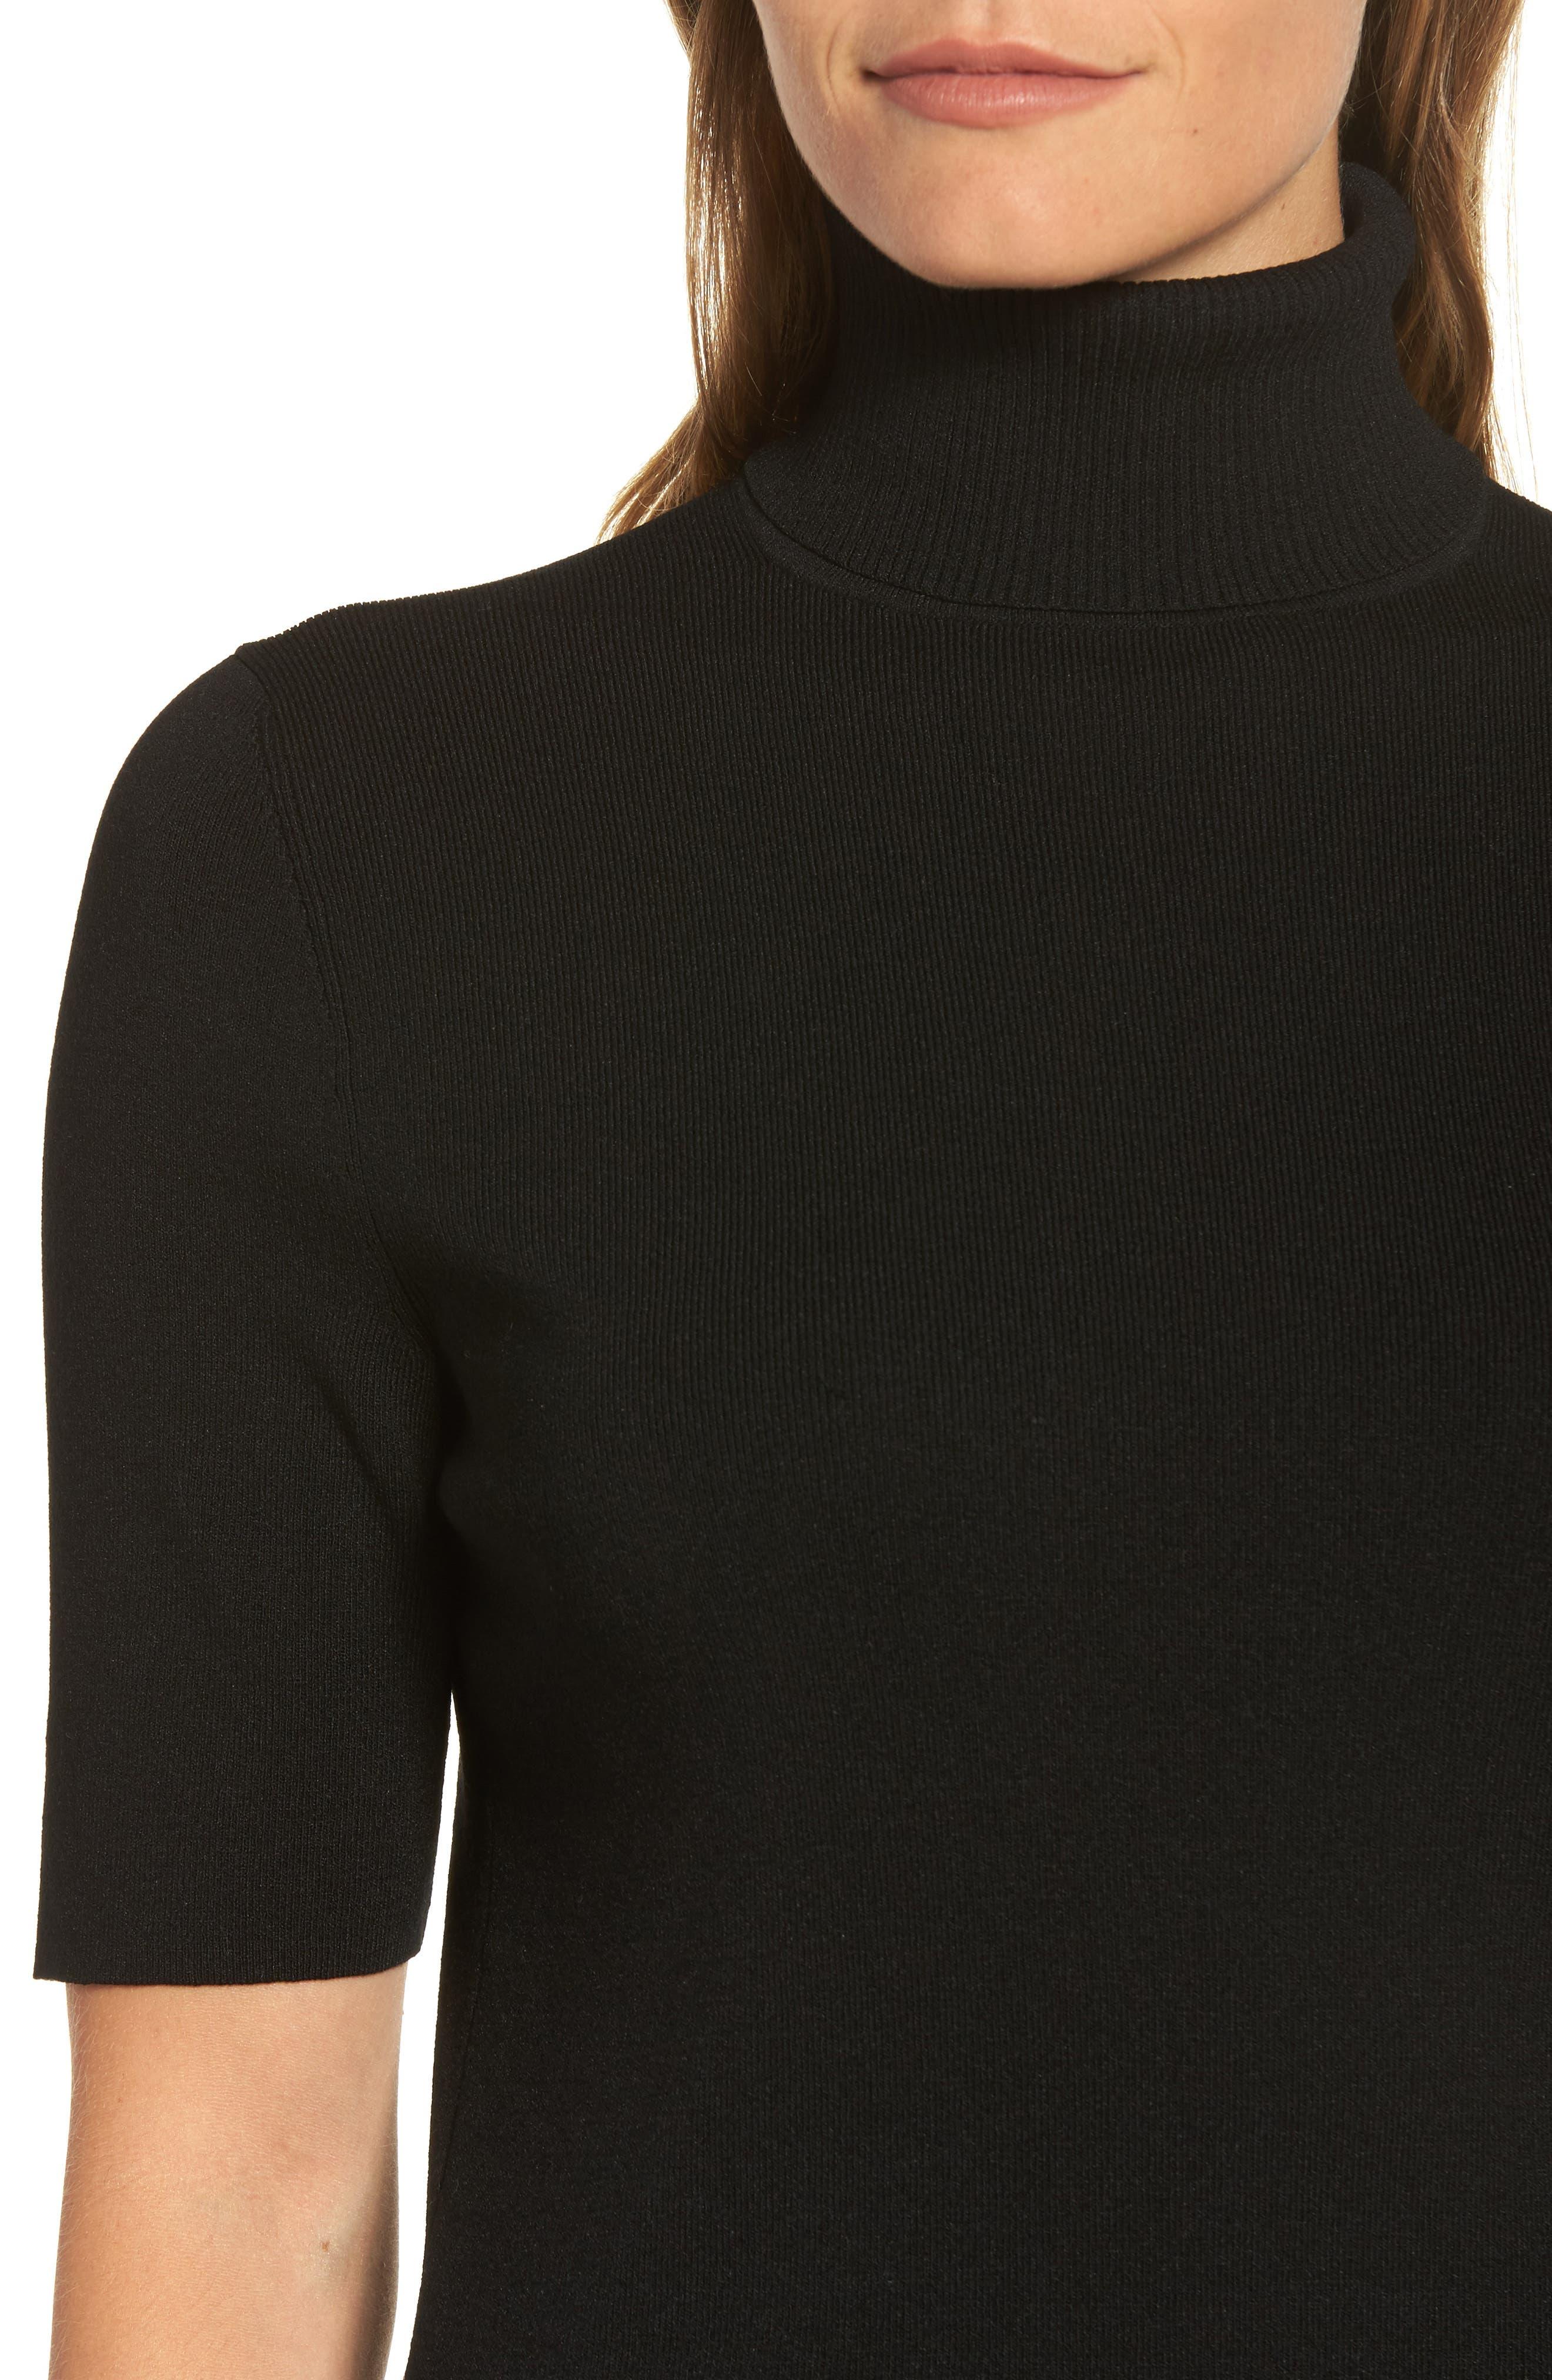 Turtleneck Sweater,                             Alternate thumbnail 4, color,                             Black